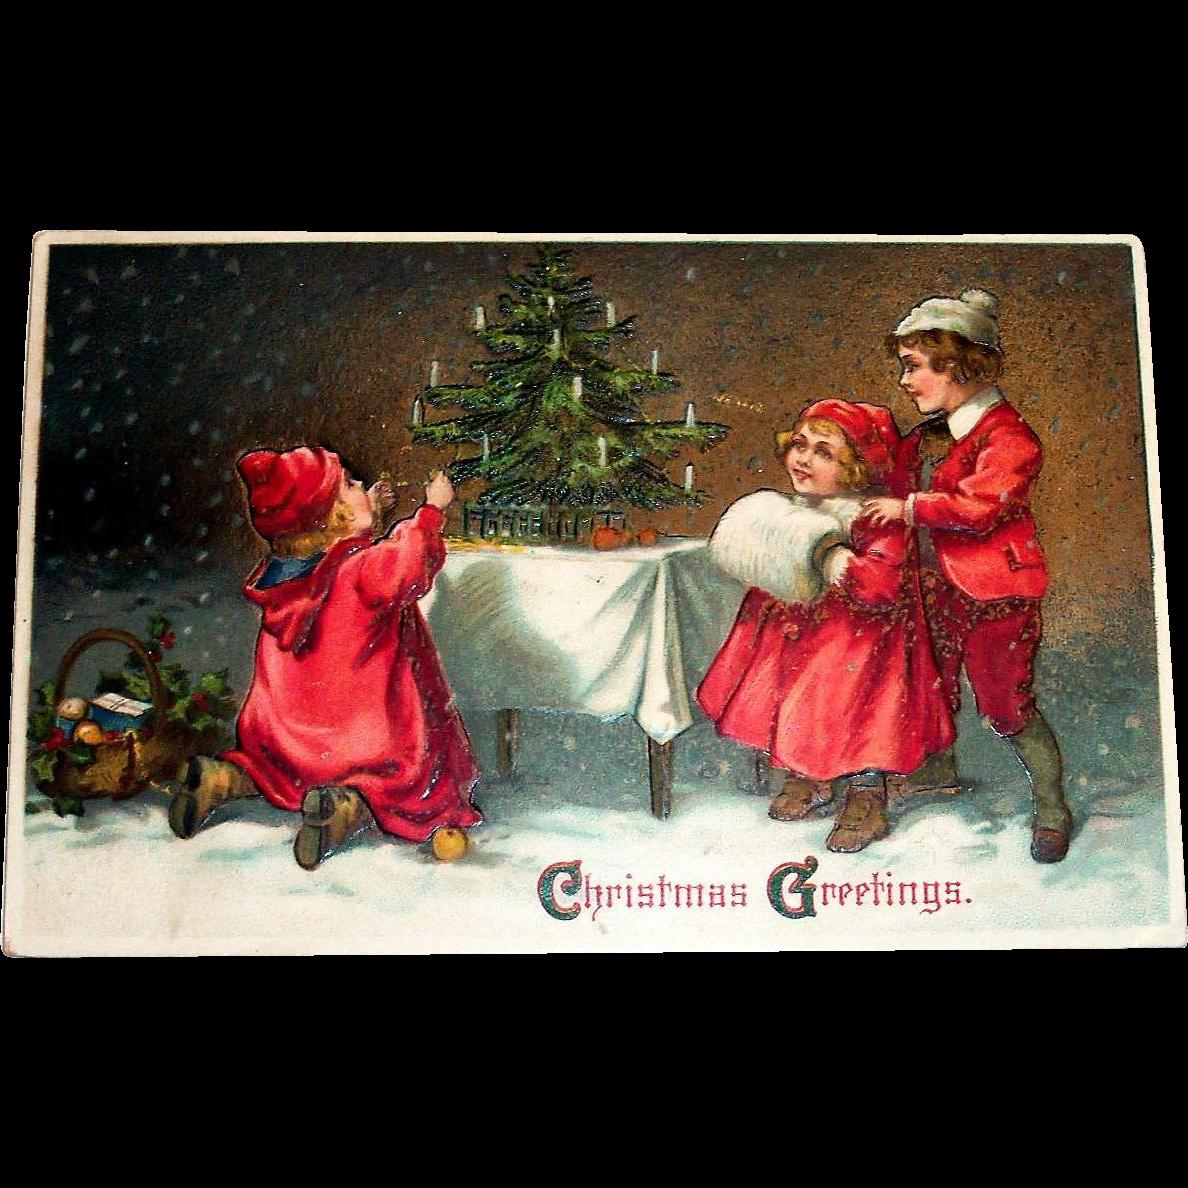 Christmas Greetings Postcard 3 Children In Red Admiring Christmas Tree